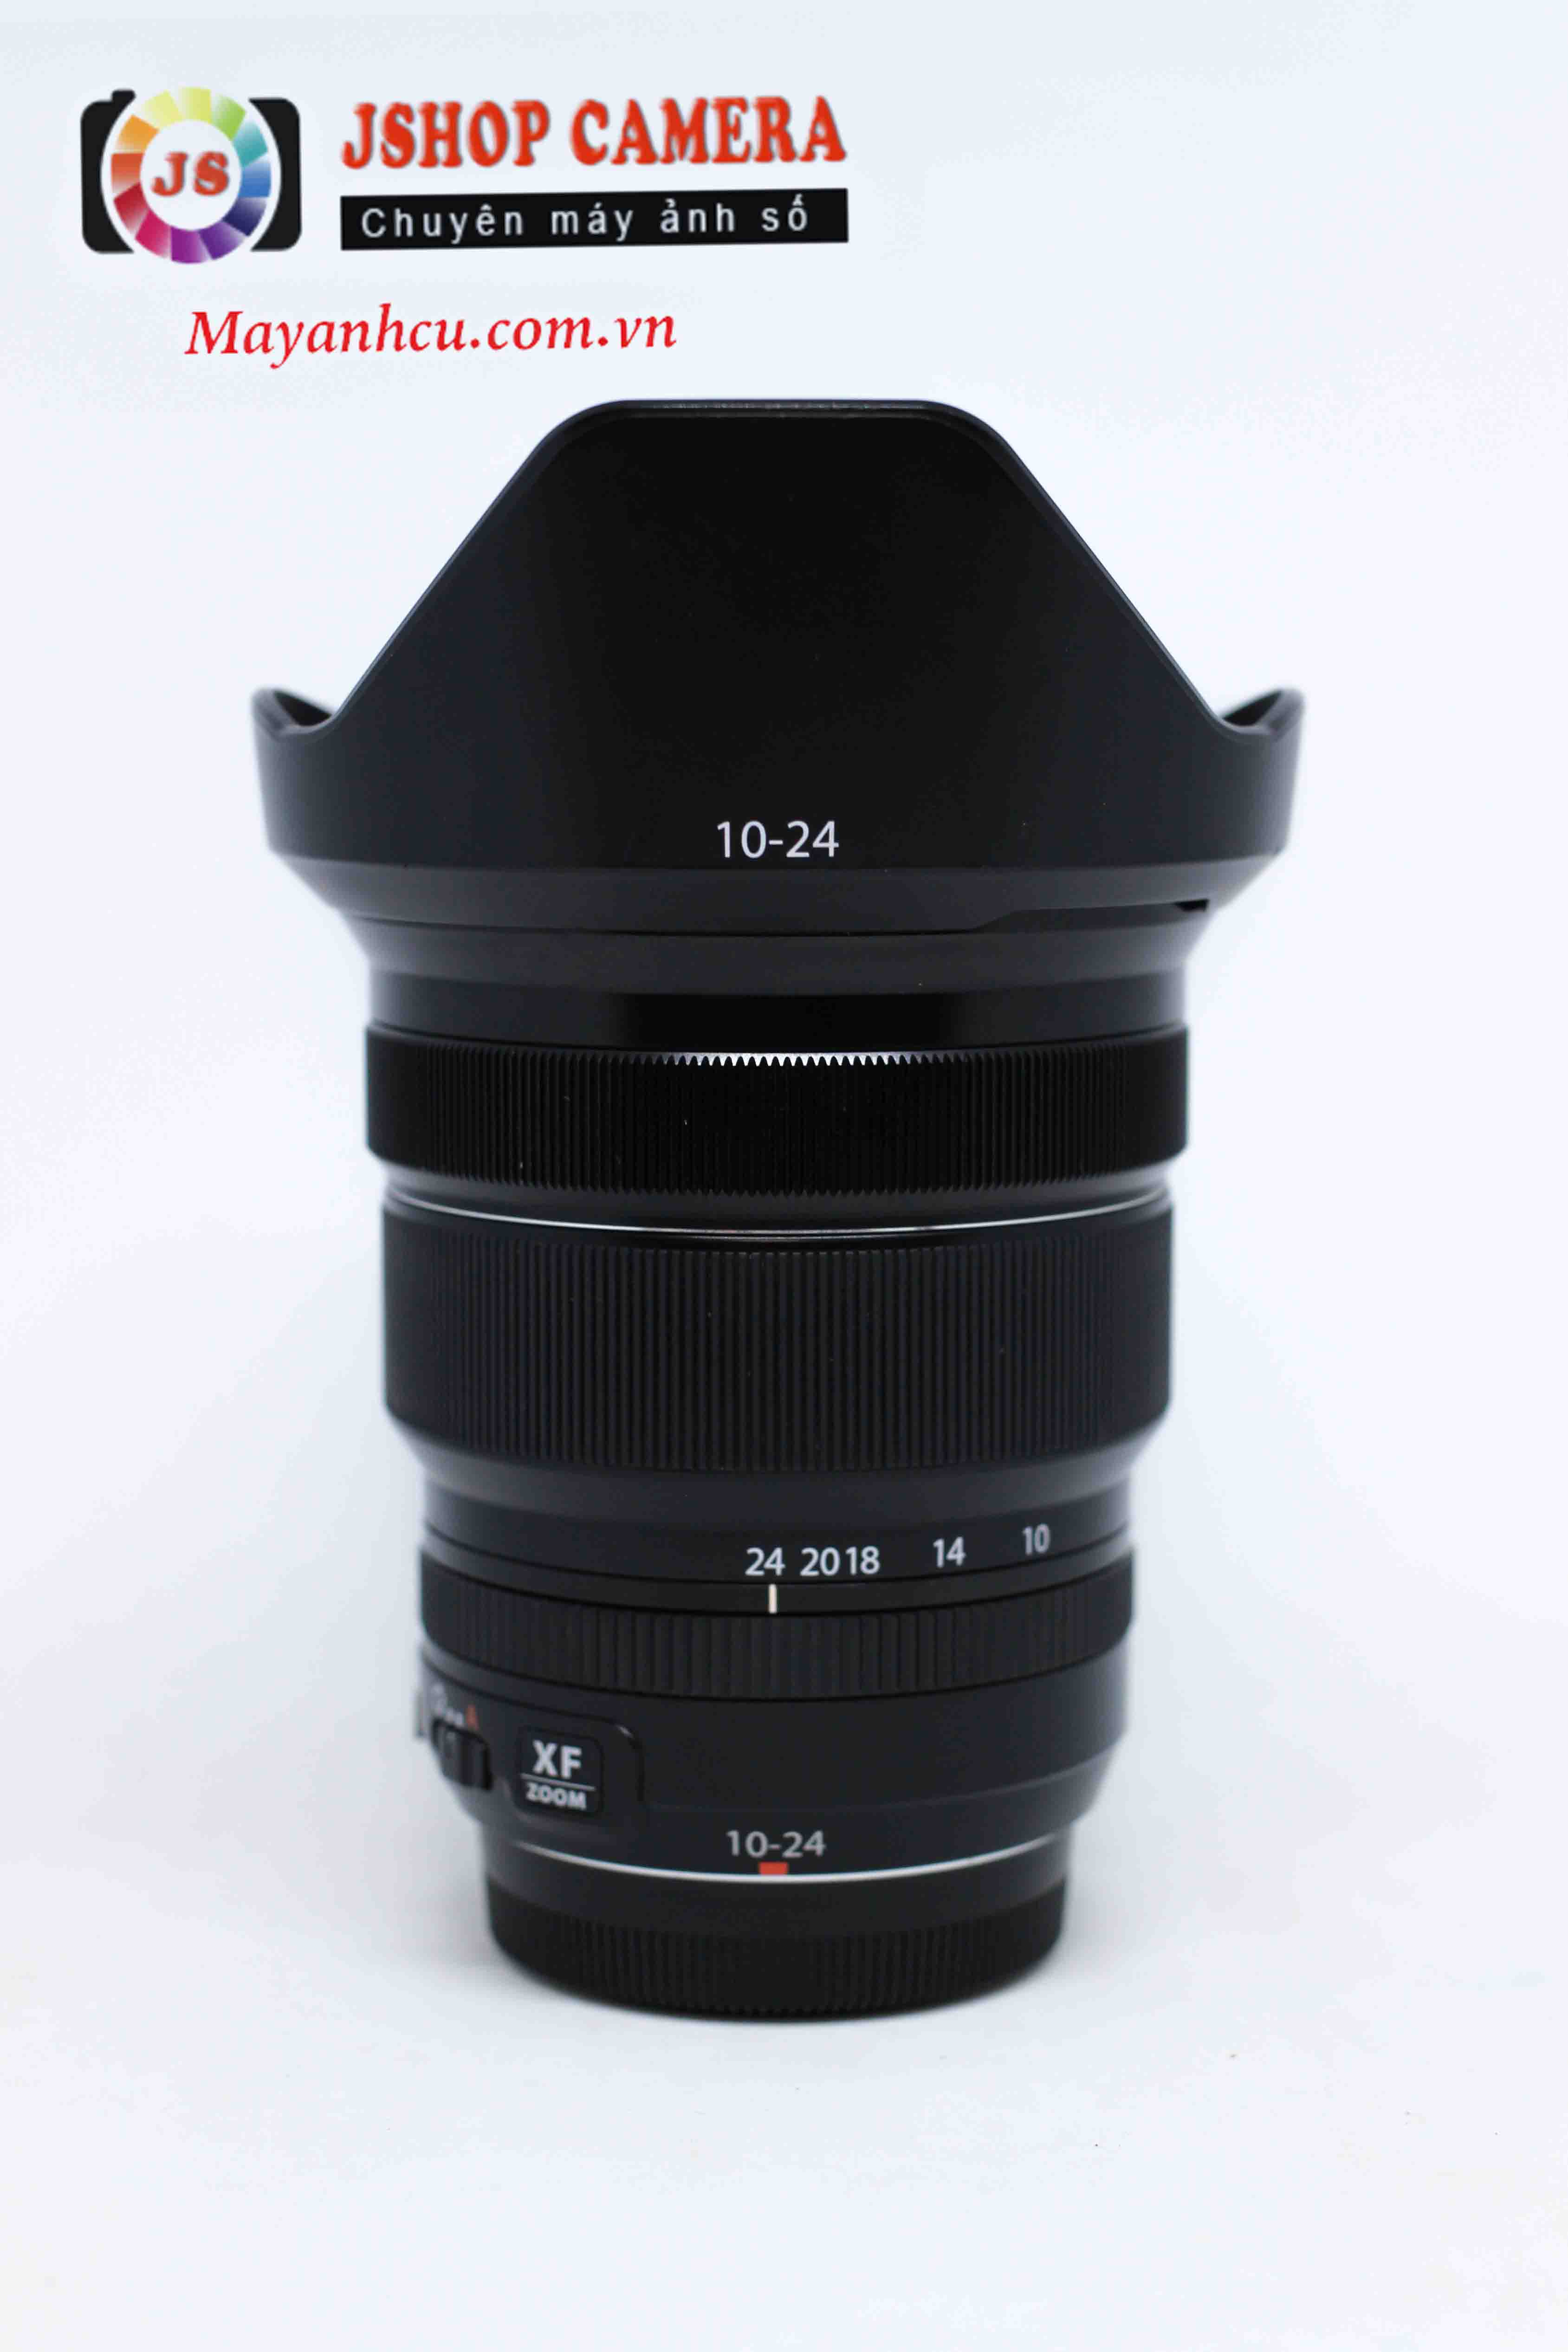 Ống kính Fujifilm XF 10-24mm f/4 R OIS